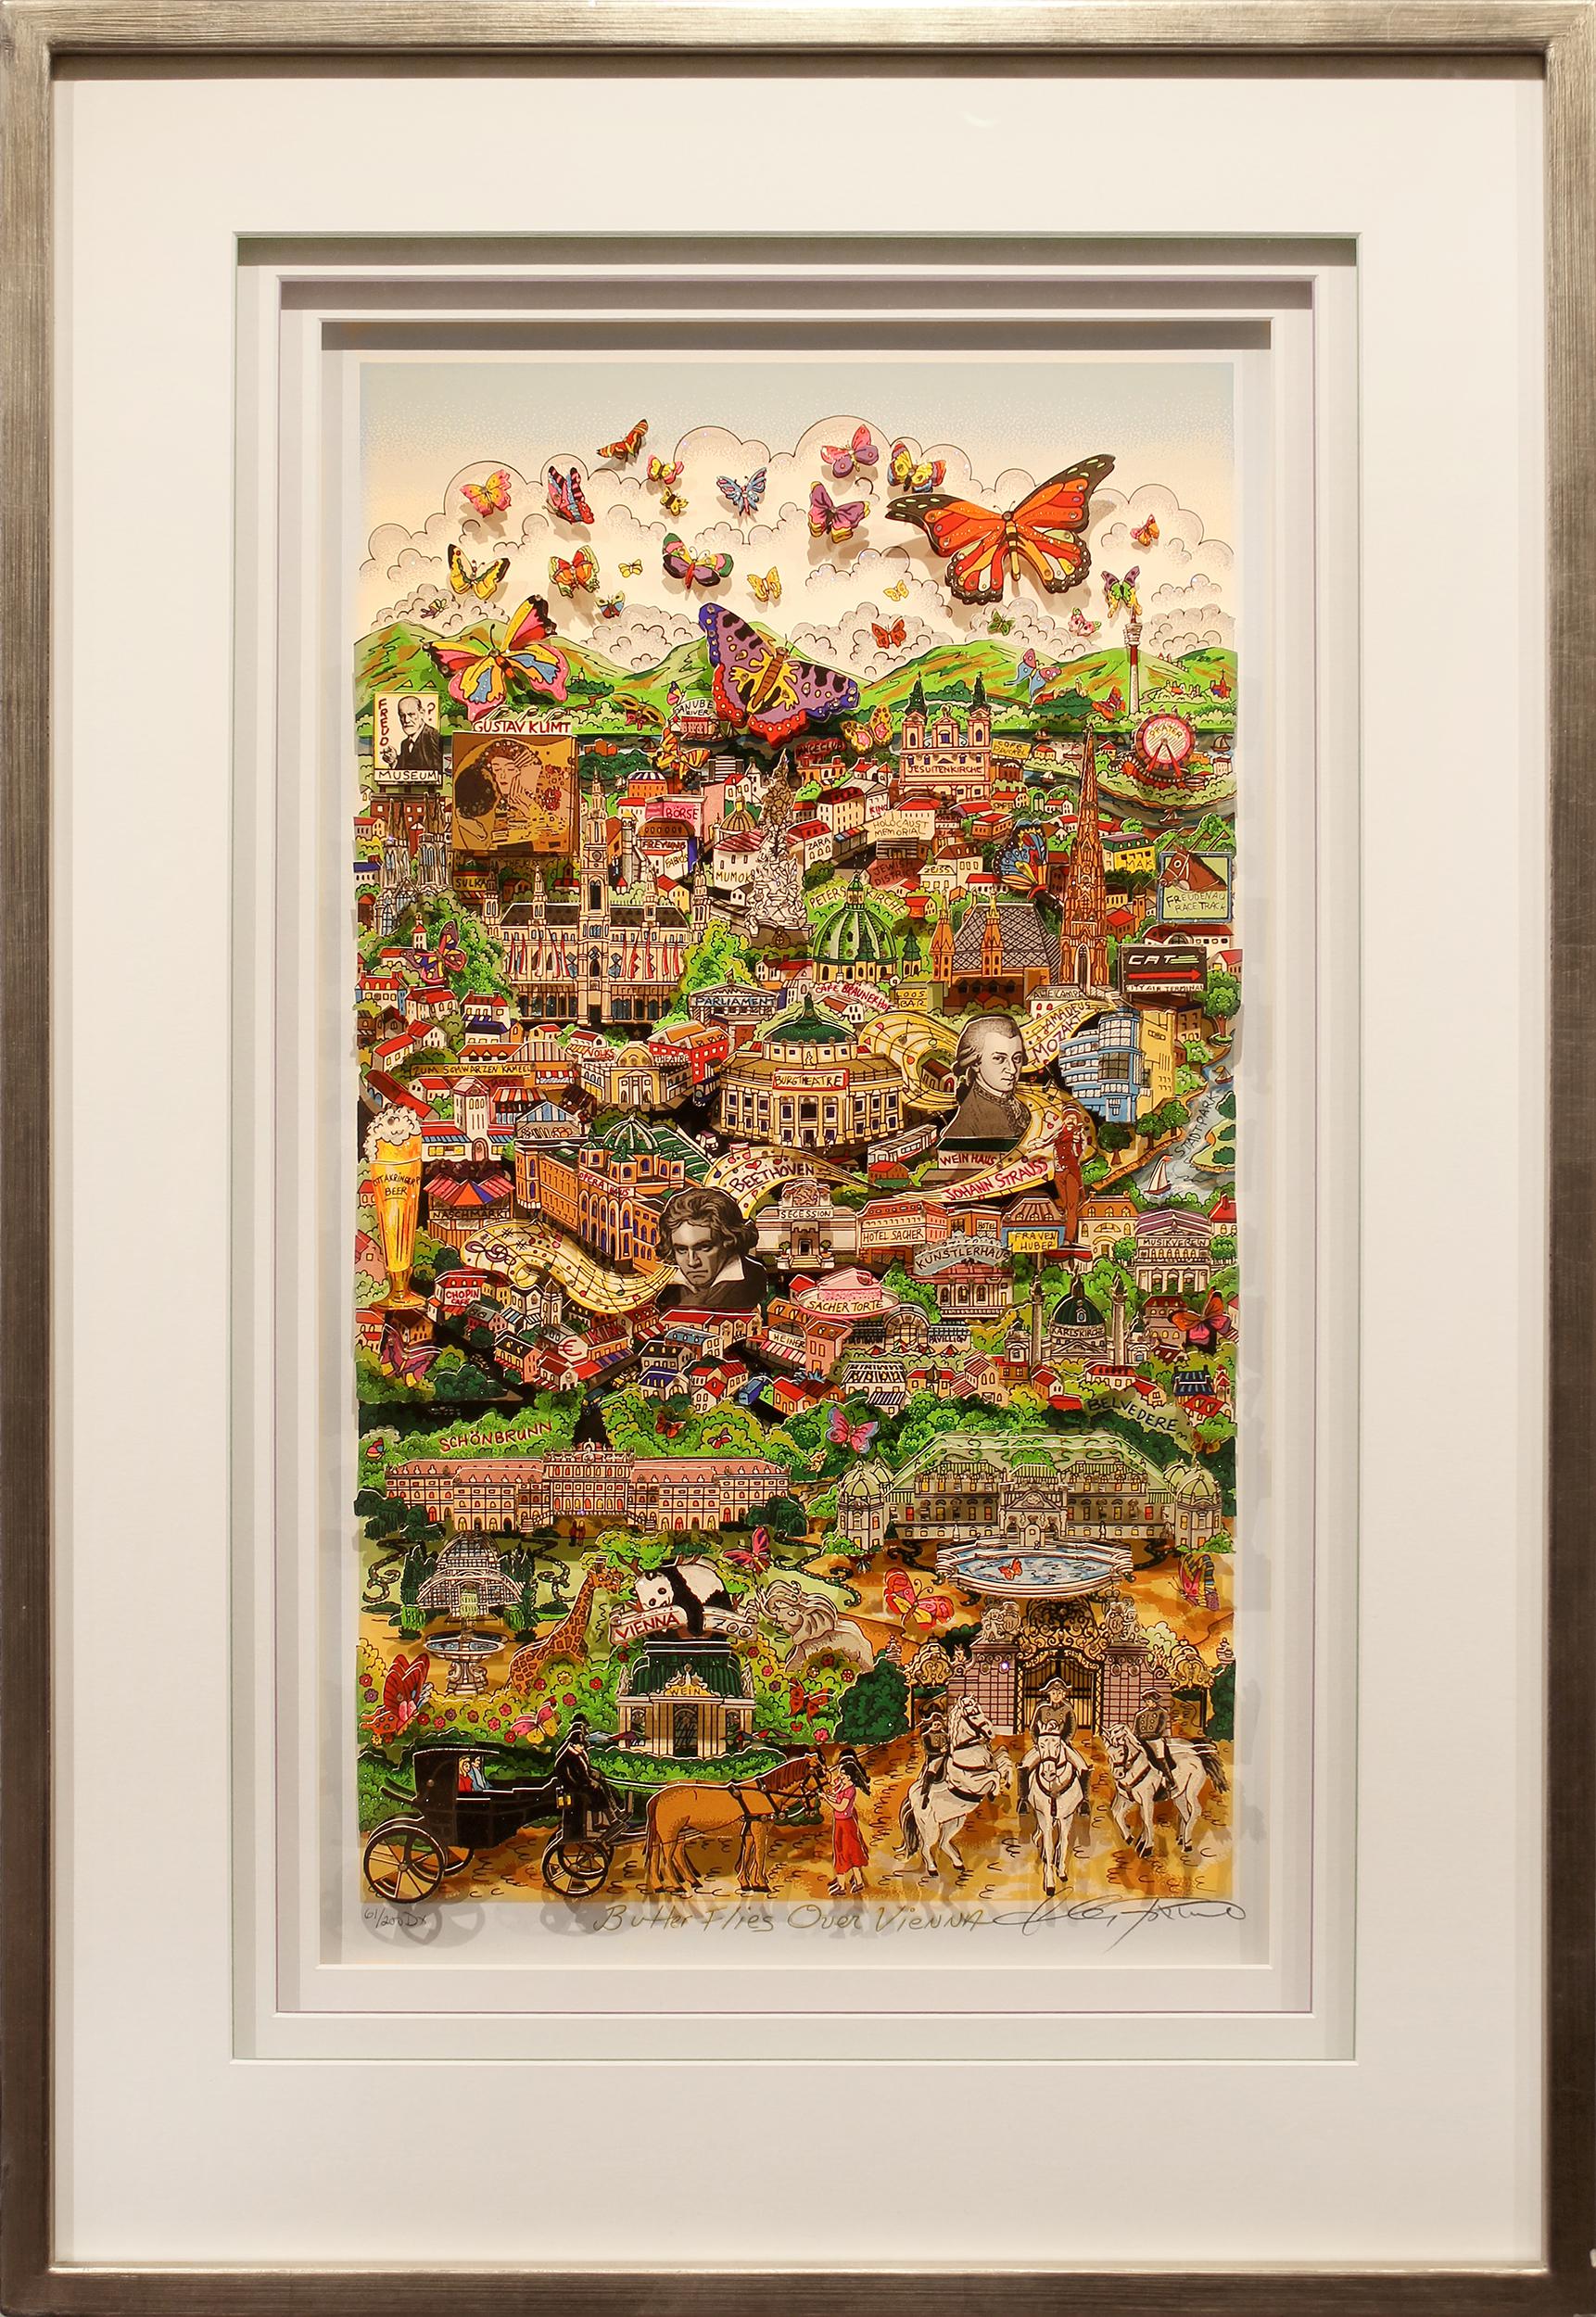 Charles Fazzino - Butterflies over Vienna, 5552-008-662